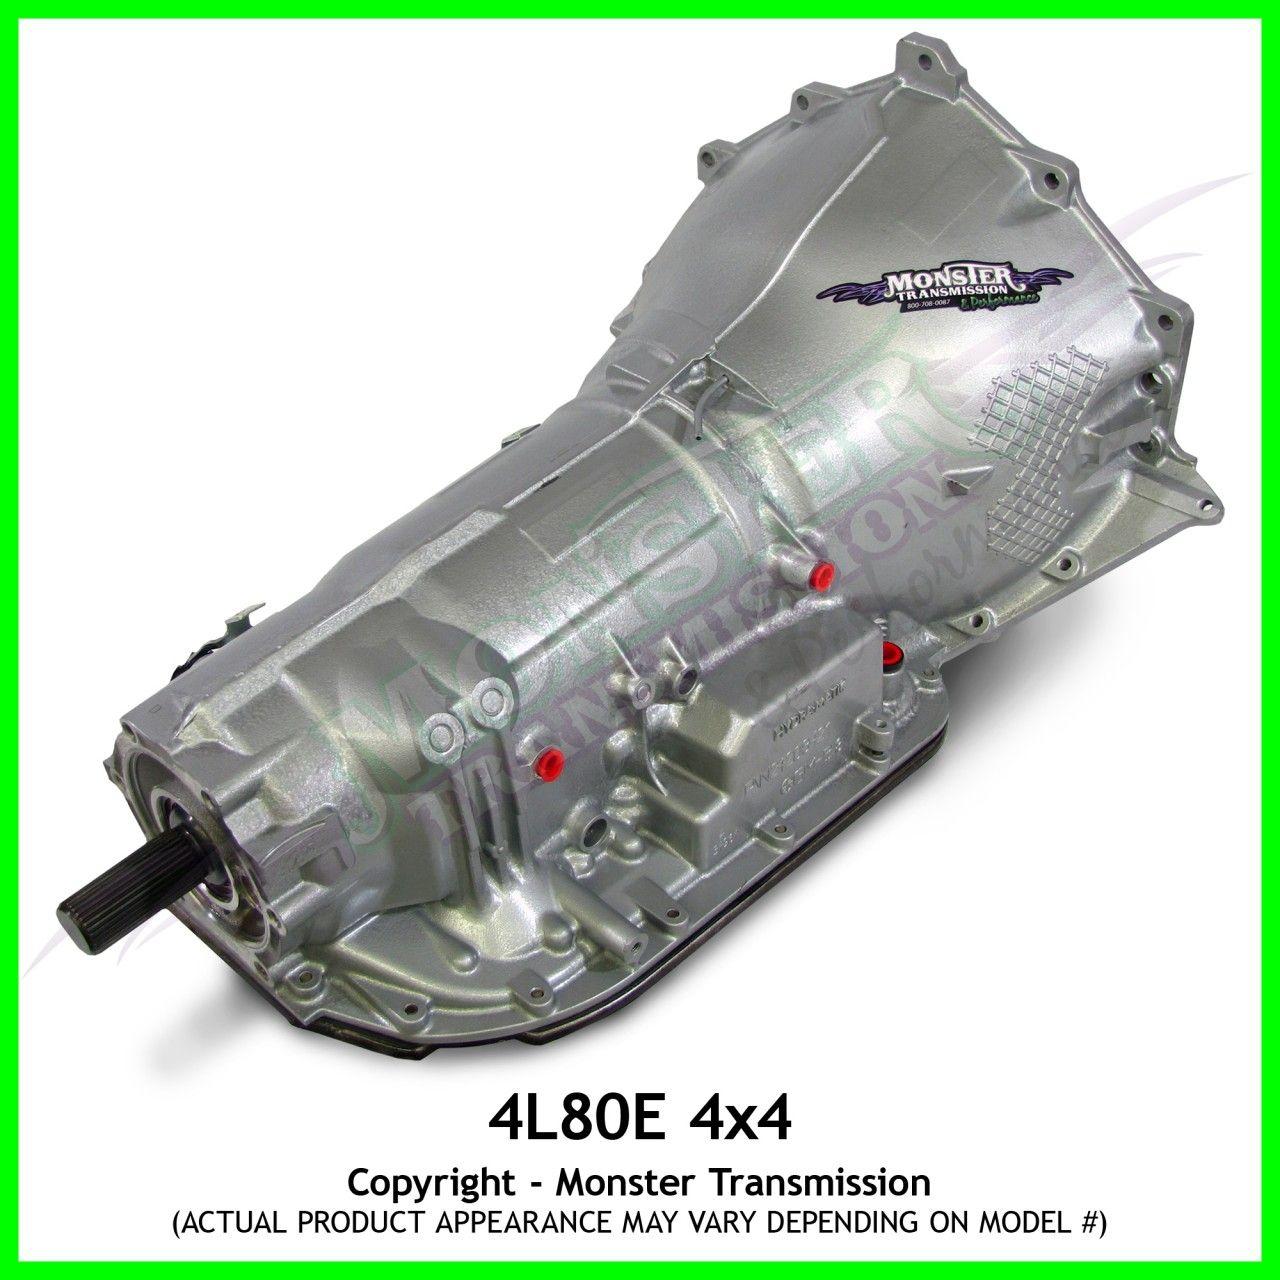 4l80e transmission 4wd, 4l80e 4x4, 4l80-e, 4l80, super duty 4l80e, rebuild  4l80e, monster 4l80e transmission, 4l80e free shipping